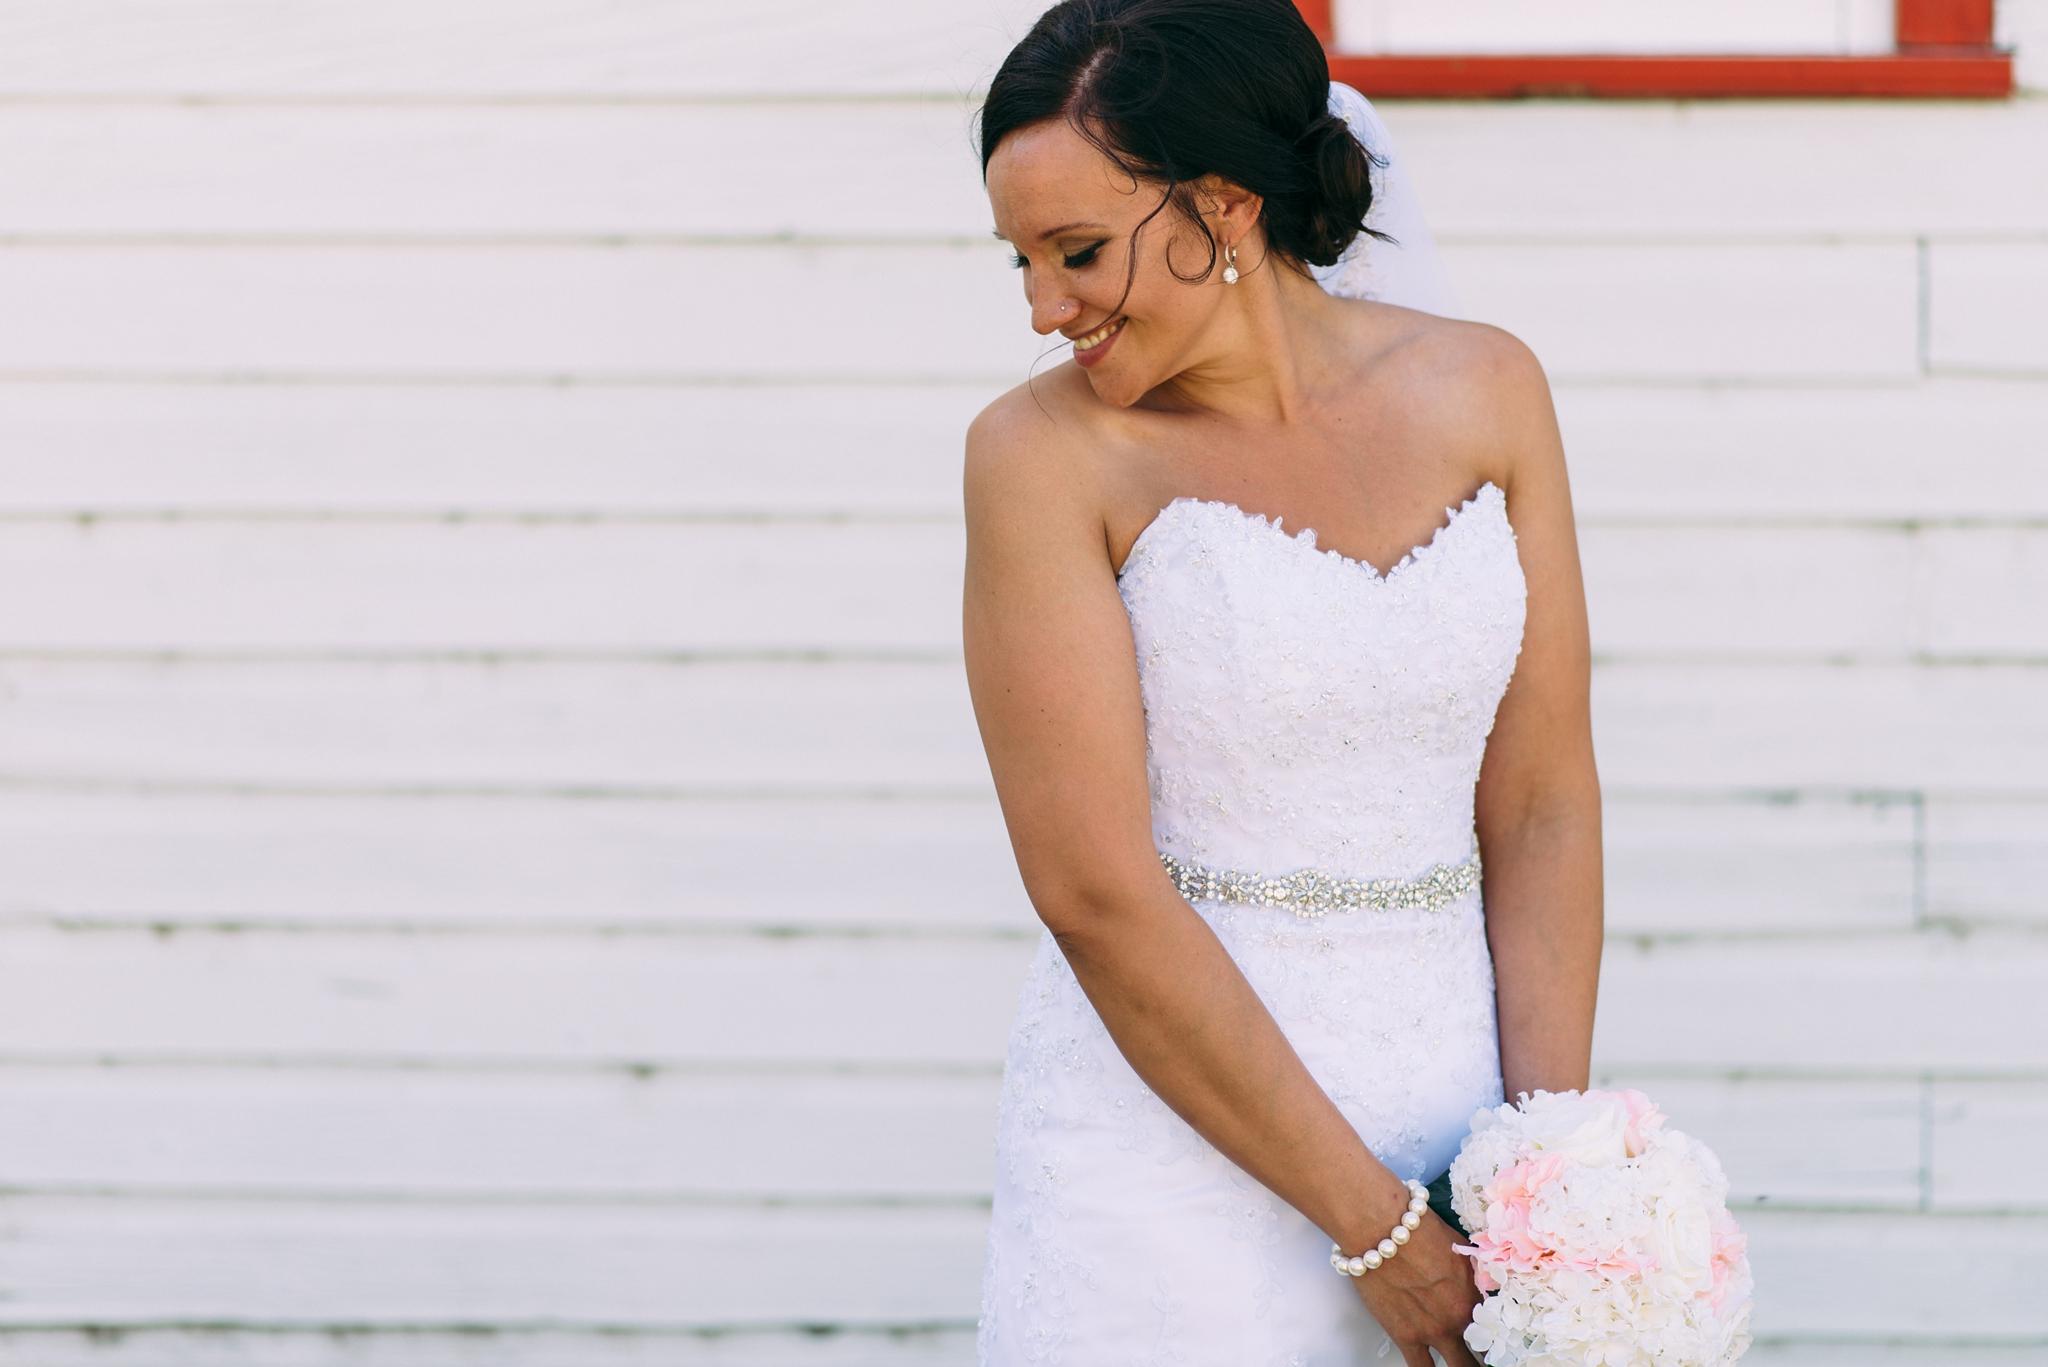 kaihla_tonai_intimate_wedding_elopement_photographer_1545